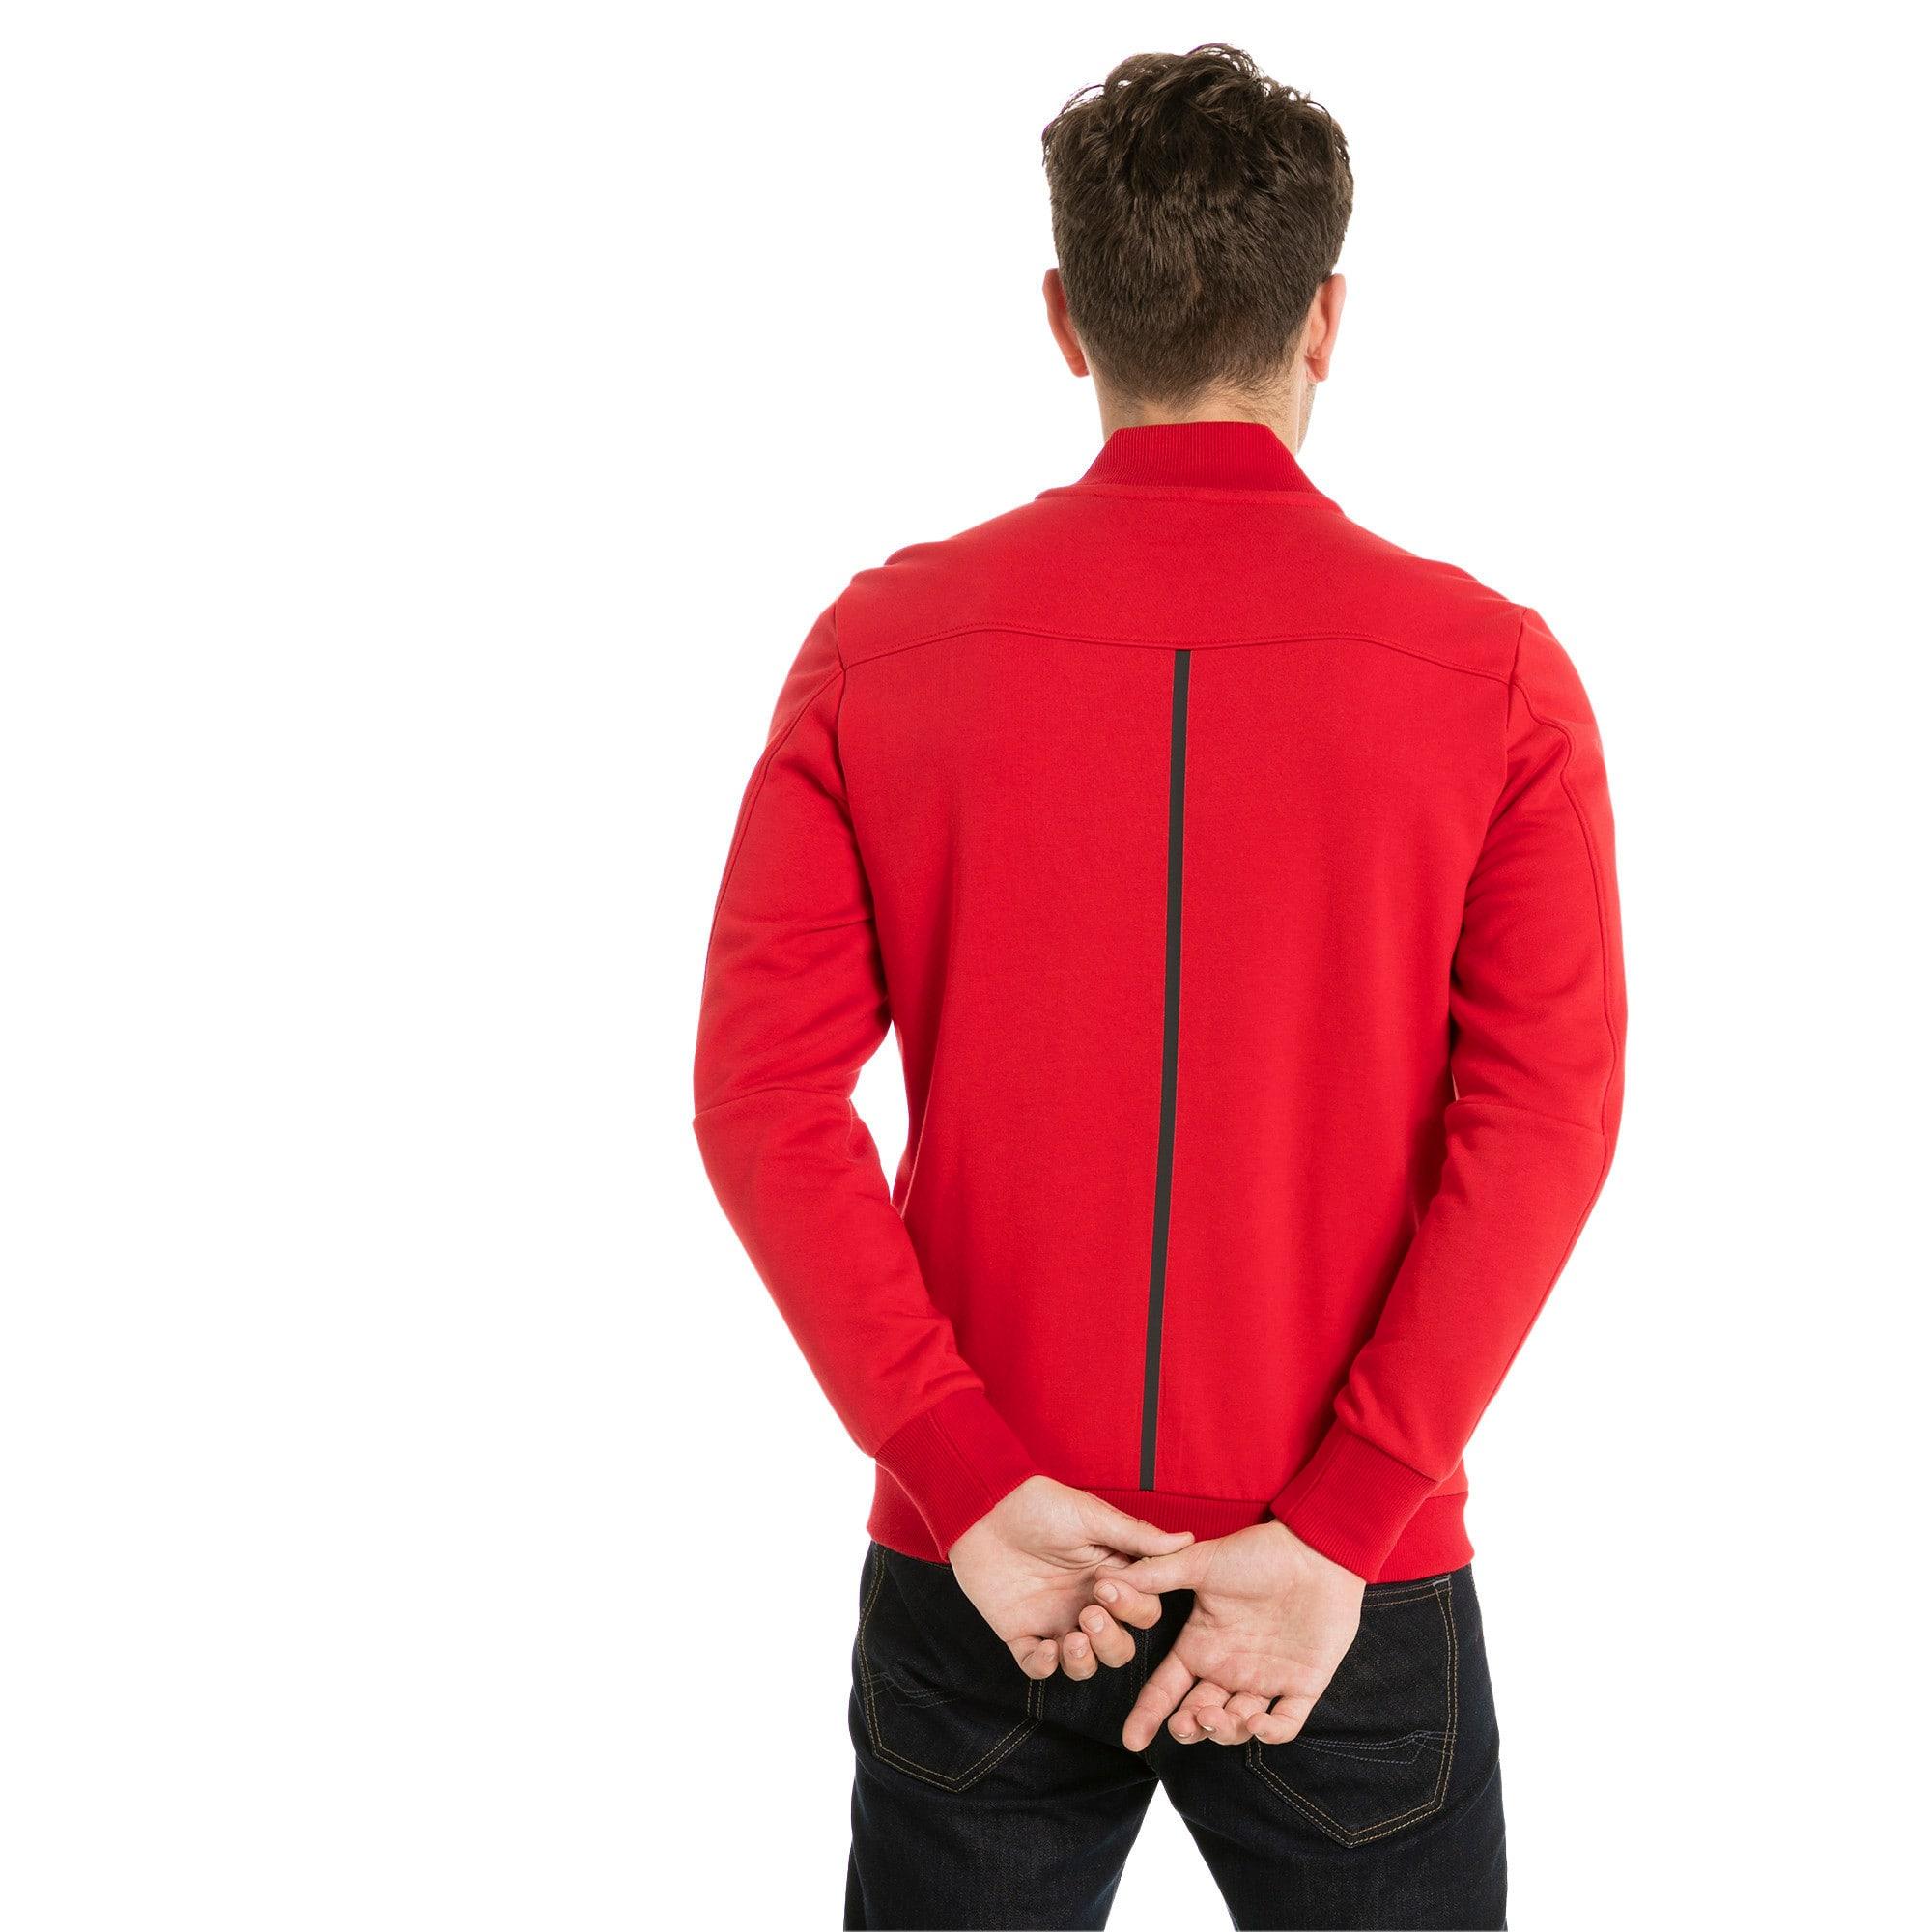 Thumbnail 5 of Ferrari Lifestyle Men's Sweat Jacket, Rosso Corsa, medium-IND